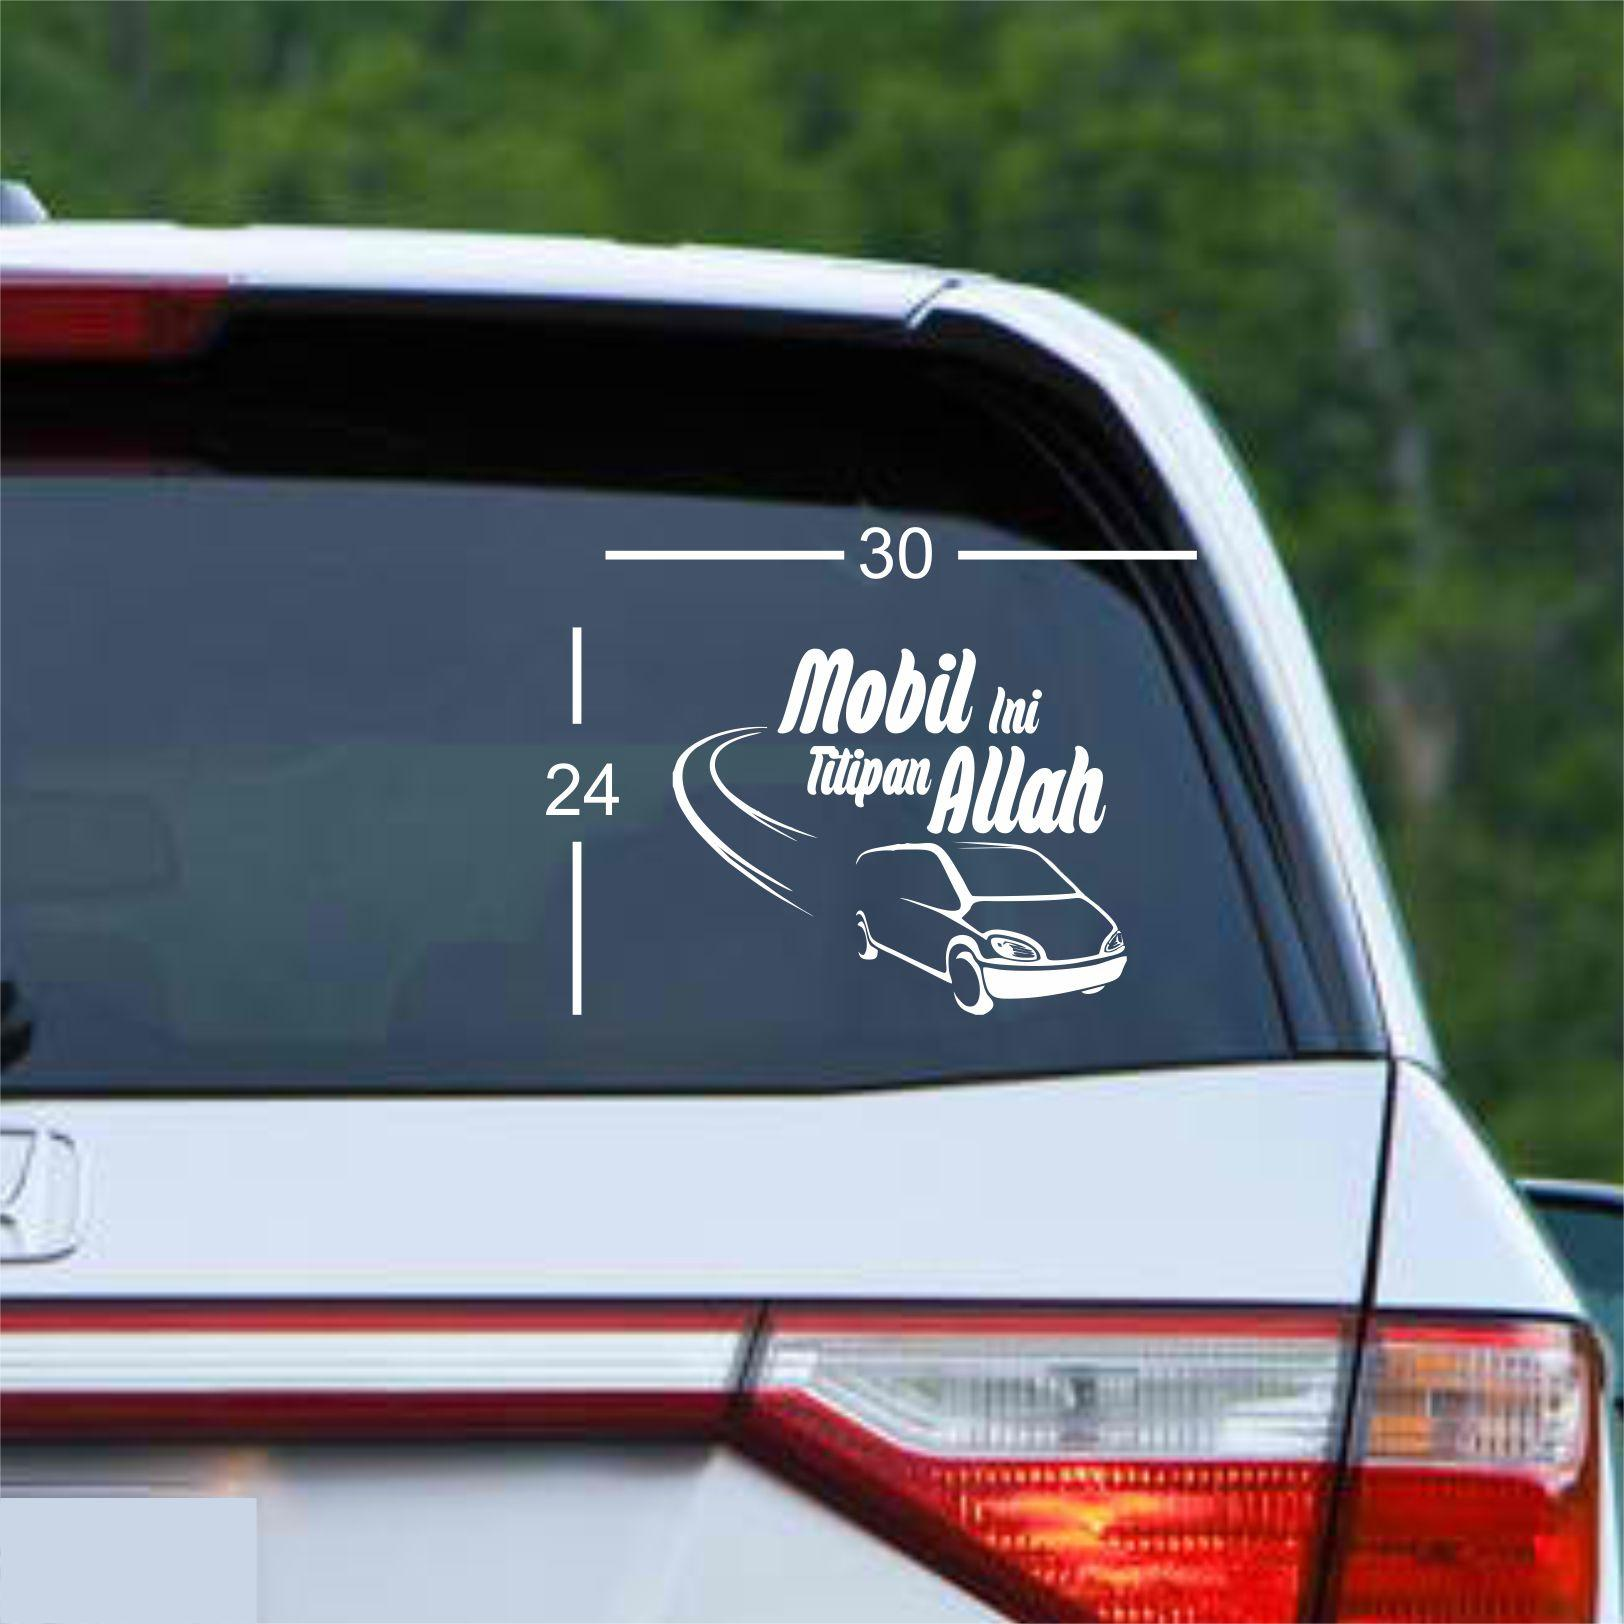 stiker kaca mobil stiker cutting stier custom stiker islami stier gaul stiker mobil kaligrafi premium tulisan mobil ini titipan allah bayar ditempat